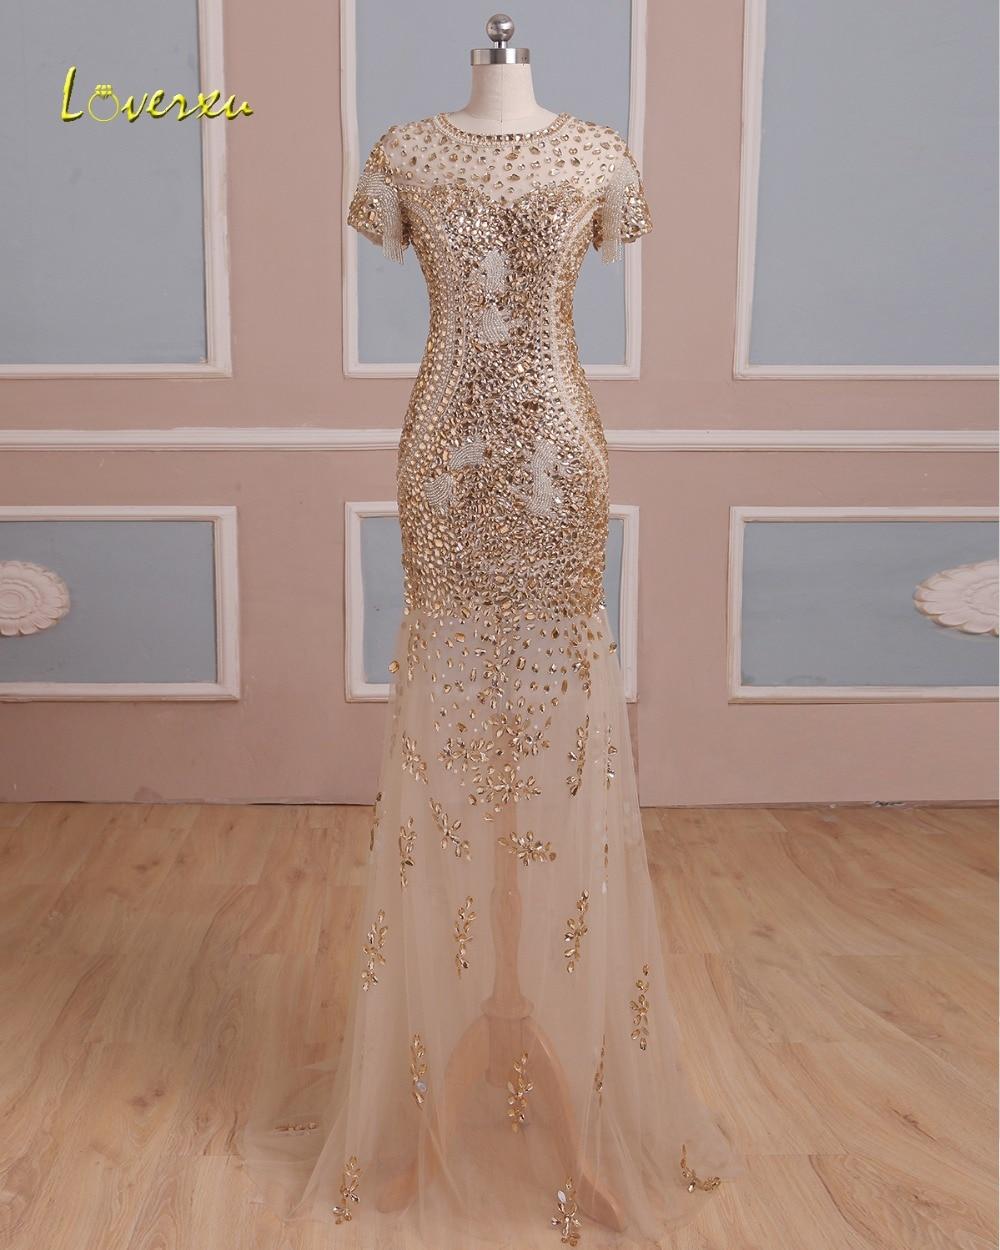 Loverxu Luxury Beaded Short Sleeve Crystal Mermaid Evening Dress 2019 Vintage O-neck Zipper Party Gown Robe De Soiree Plus Size